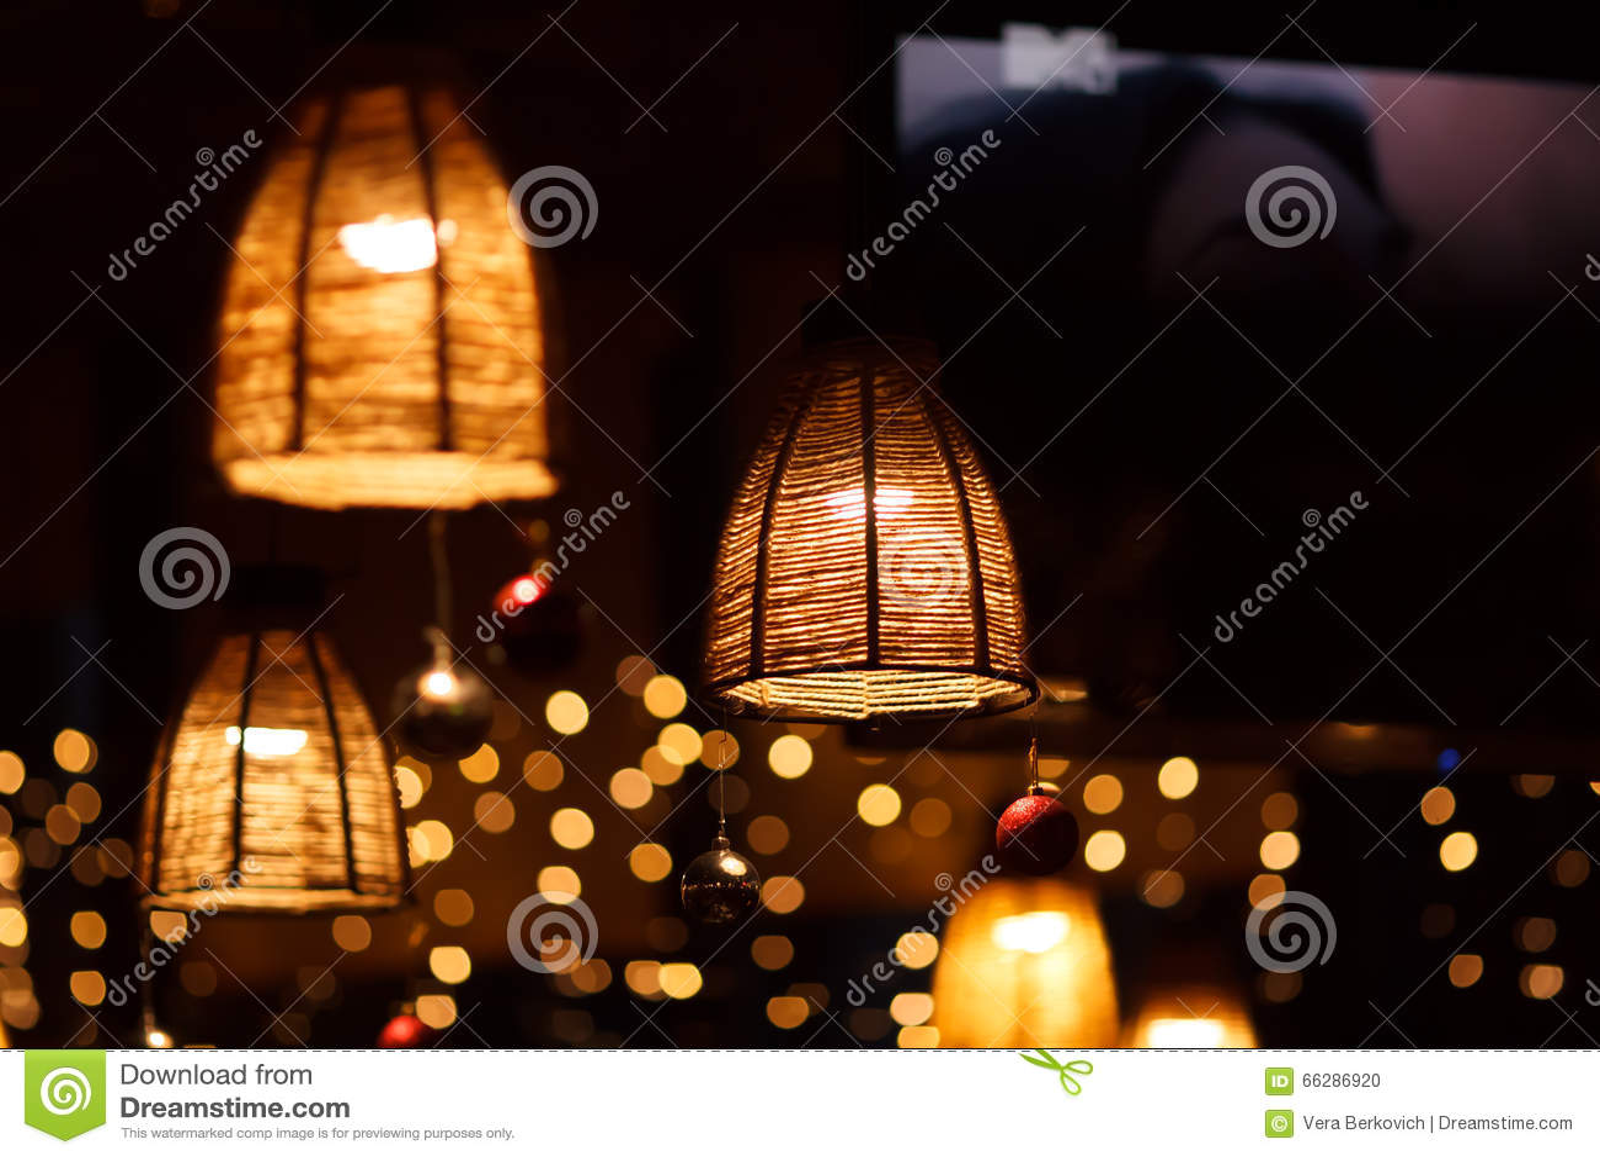 Restaurant interior at night stock photo image of depth